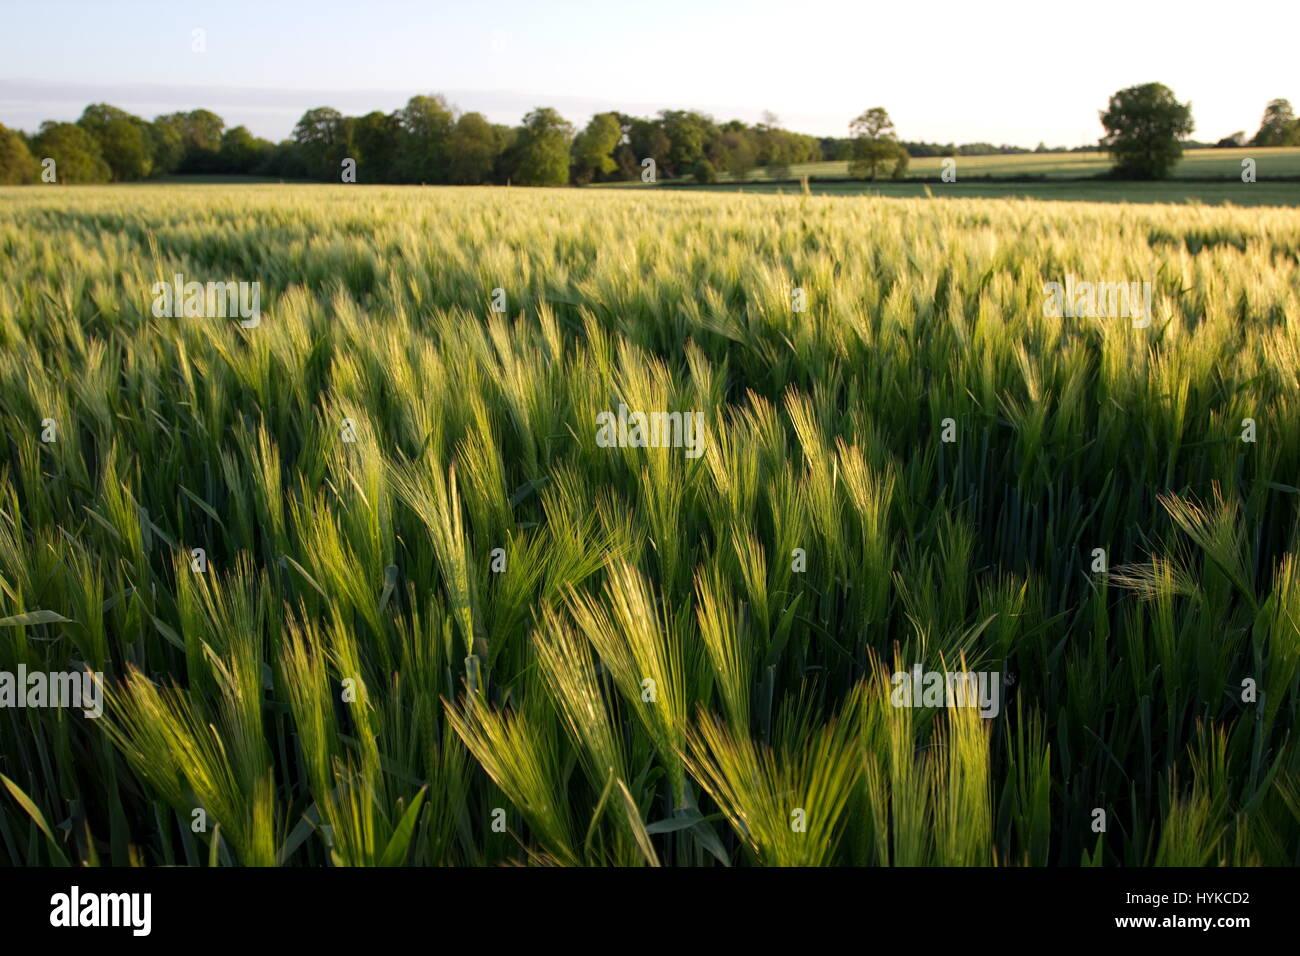 Wheat field near Hannington Hampshire - Stock Image